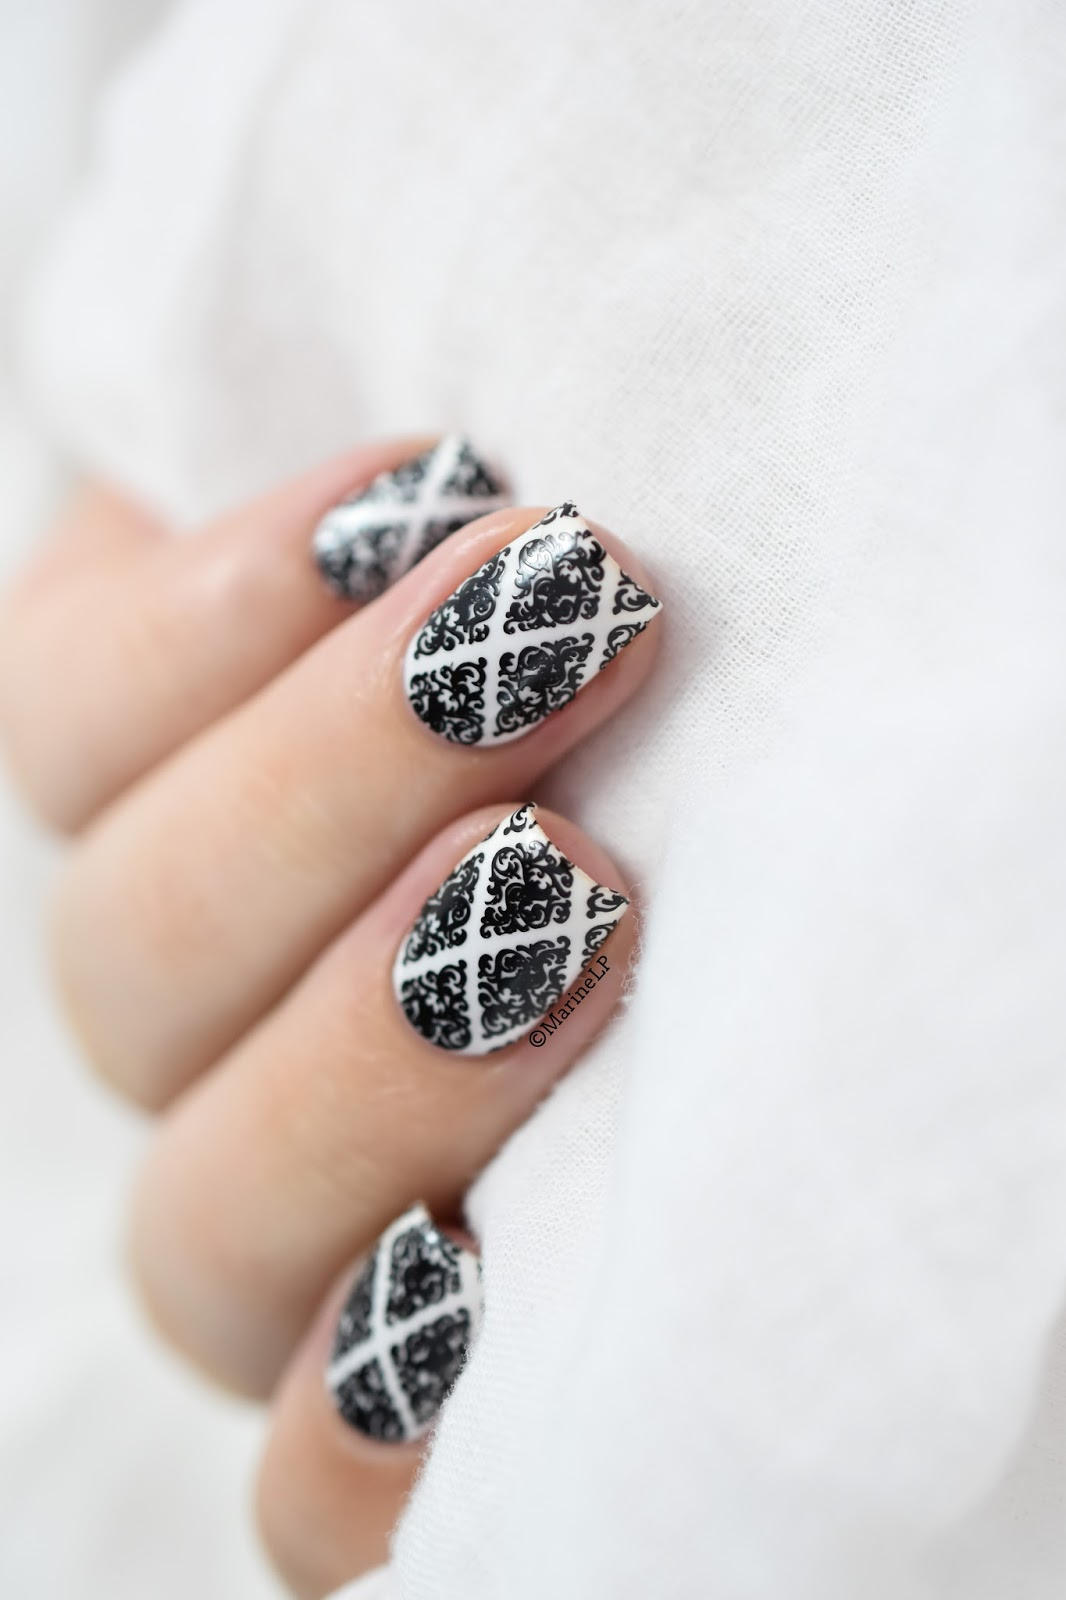 Bw Baroque Nails Marine Loves Polish And More Blog Beaut Et